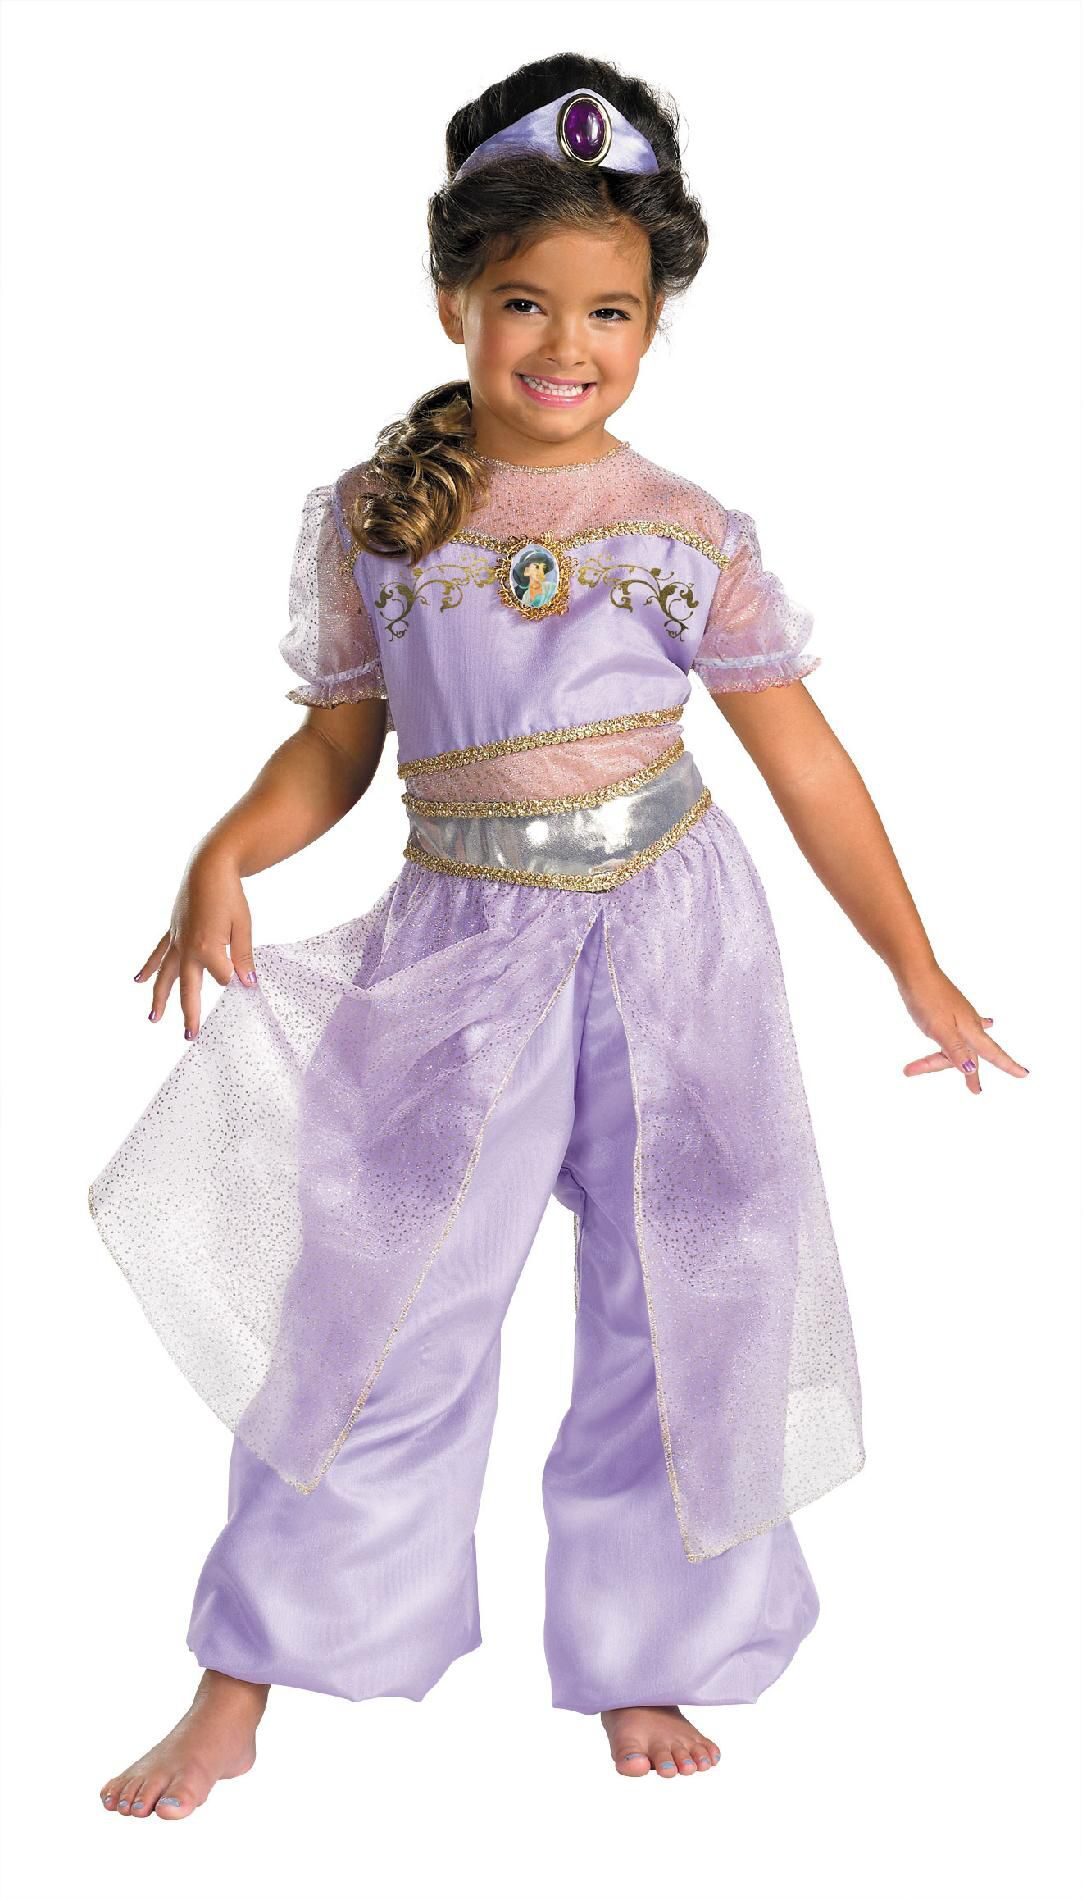 Kids Deluxe Disney Princess Jasmine Costume  sc 1 st  Mr. Costumes & Kids Deluxe Disney Princess Jasmine Costume - Mr. Costumes